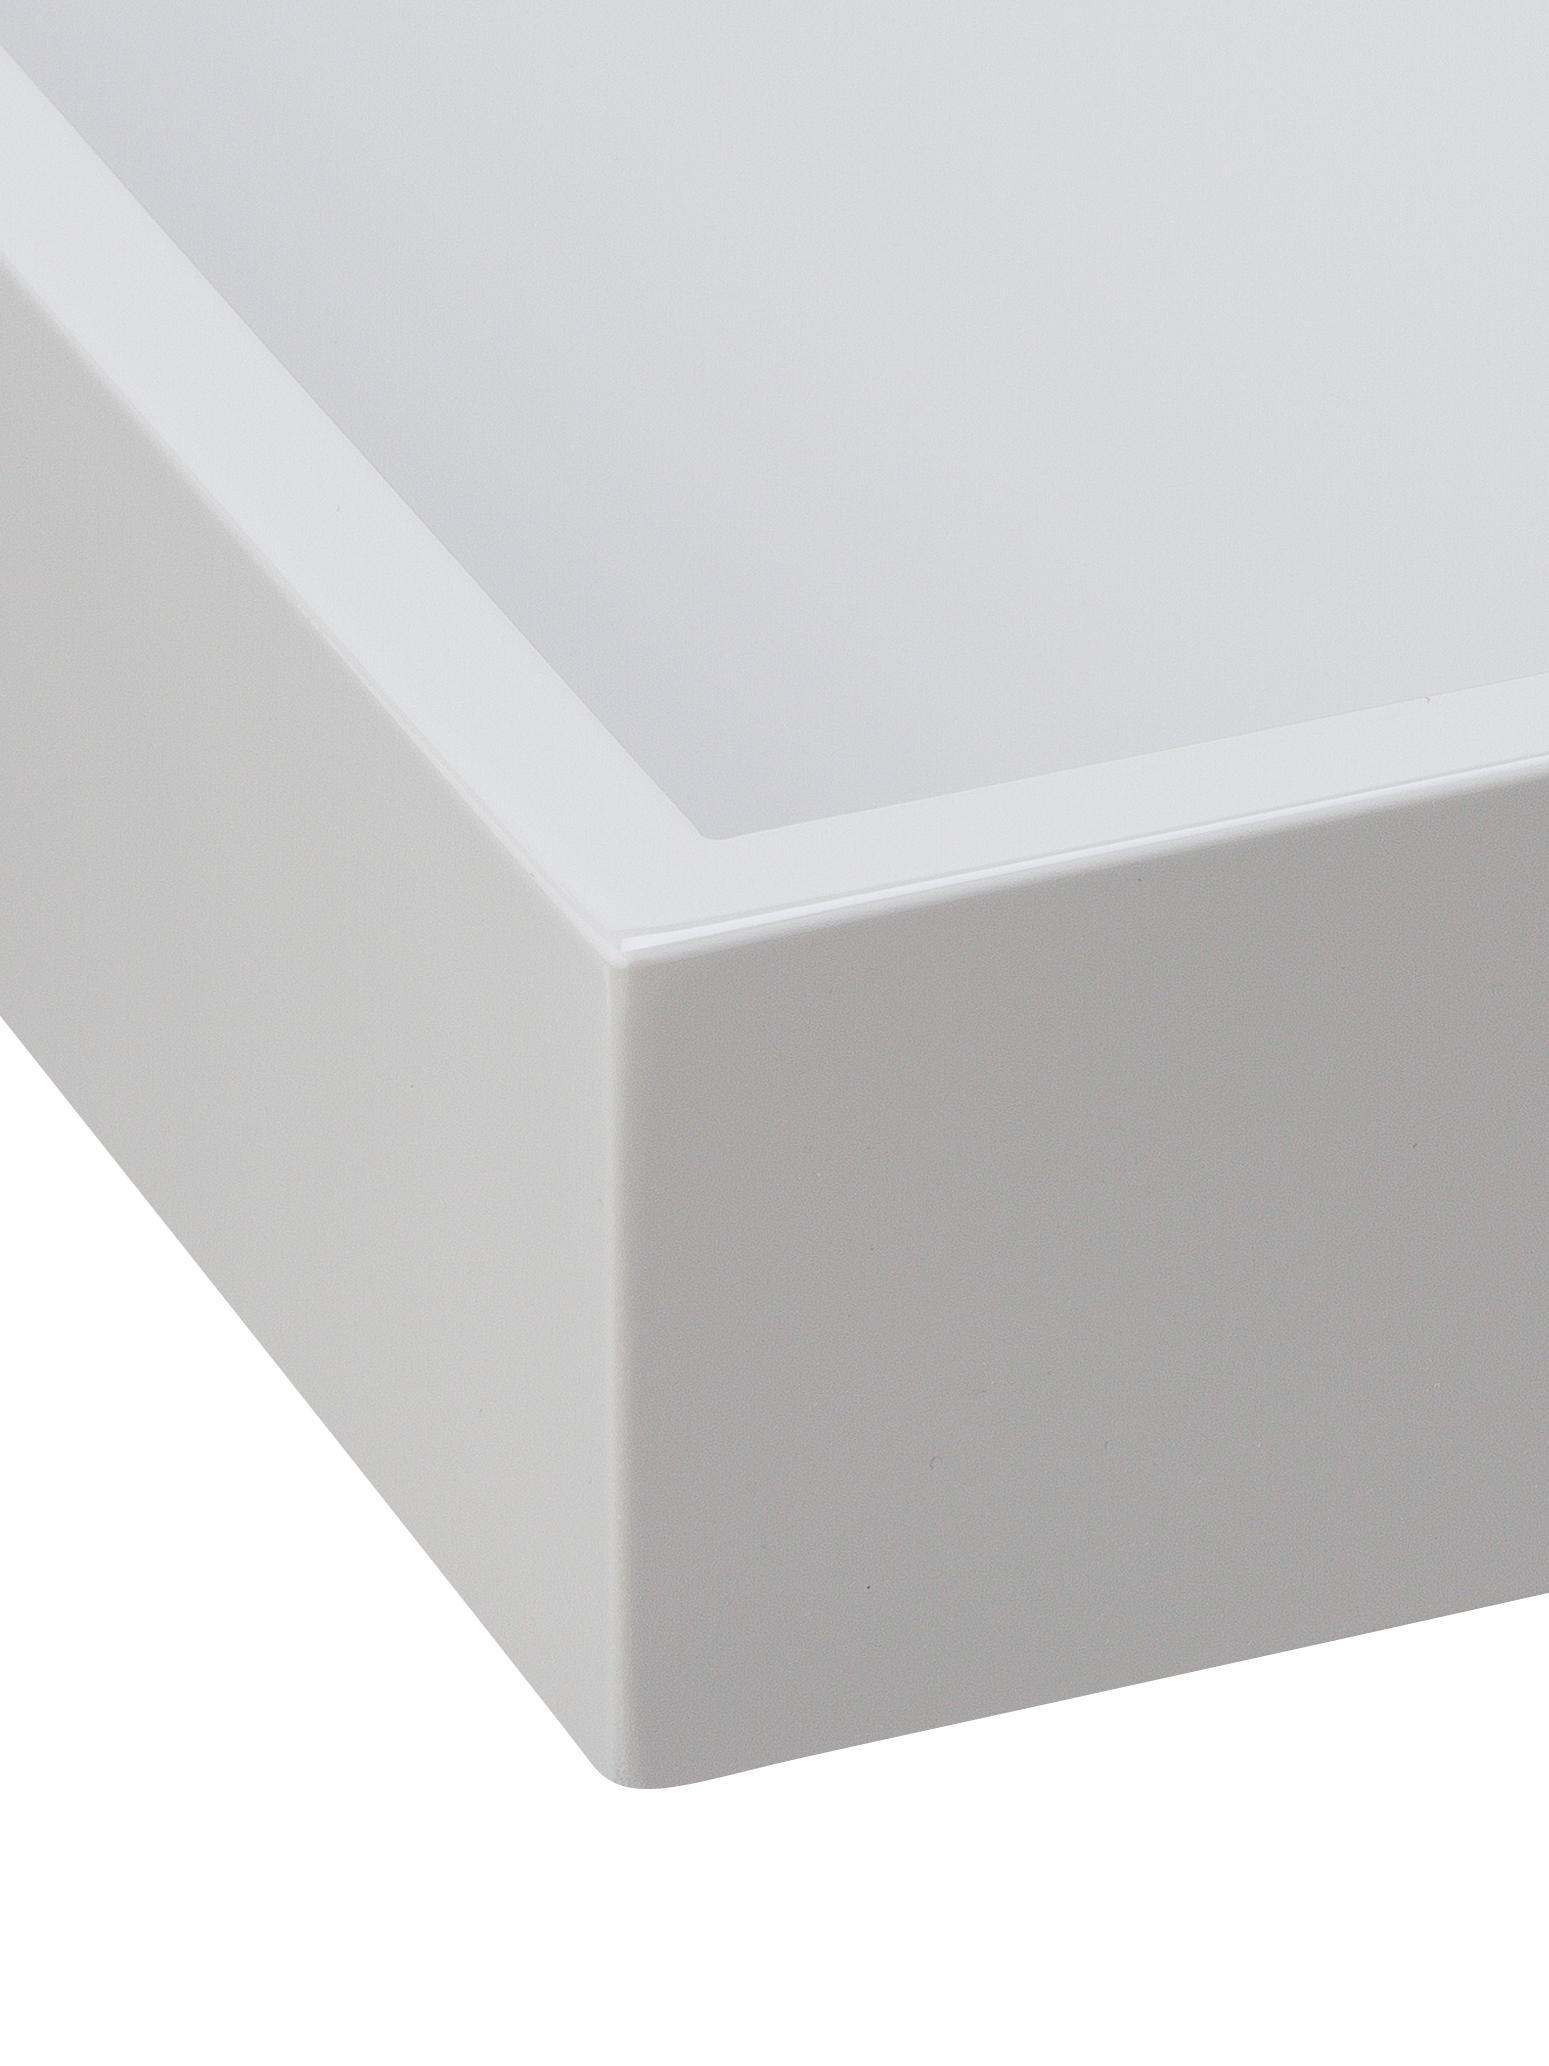 Vassoio effetto lucido Hayley, Vassoio: pannello di fibra a media, Grigio chiaro, fondo: grigio chiaro, Larg. 50 x Prof. 35 cm